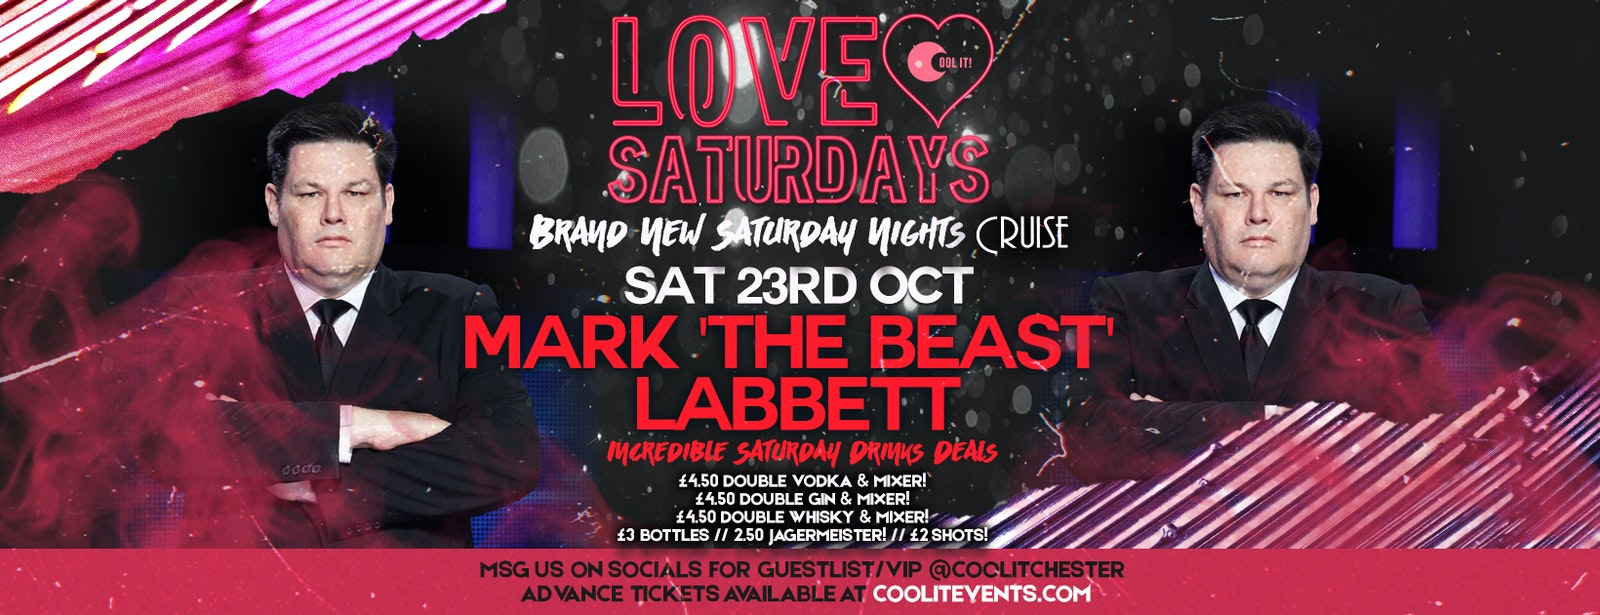 LOVE Saturdays hosted by Mark 'The Beast' Labbett